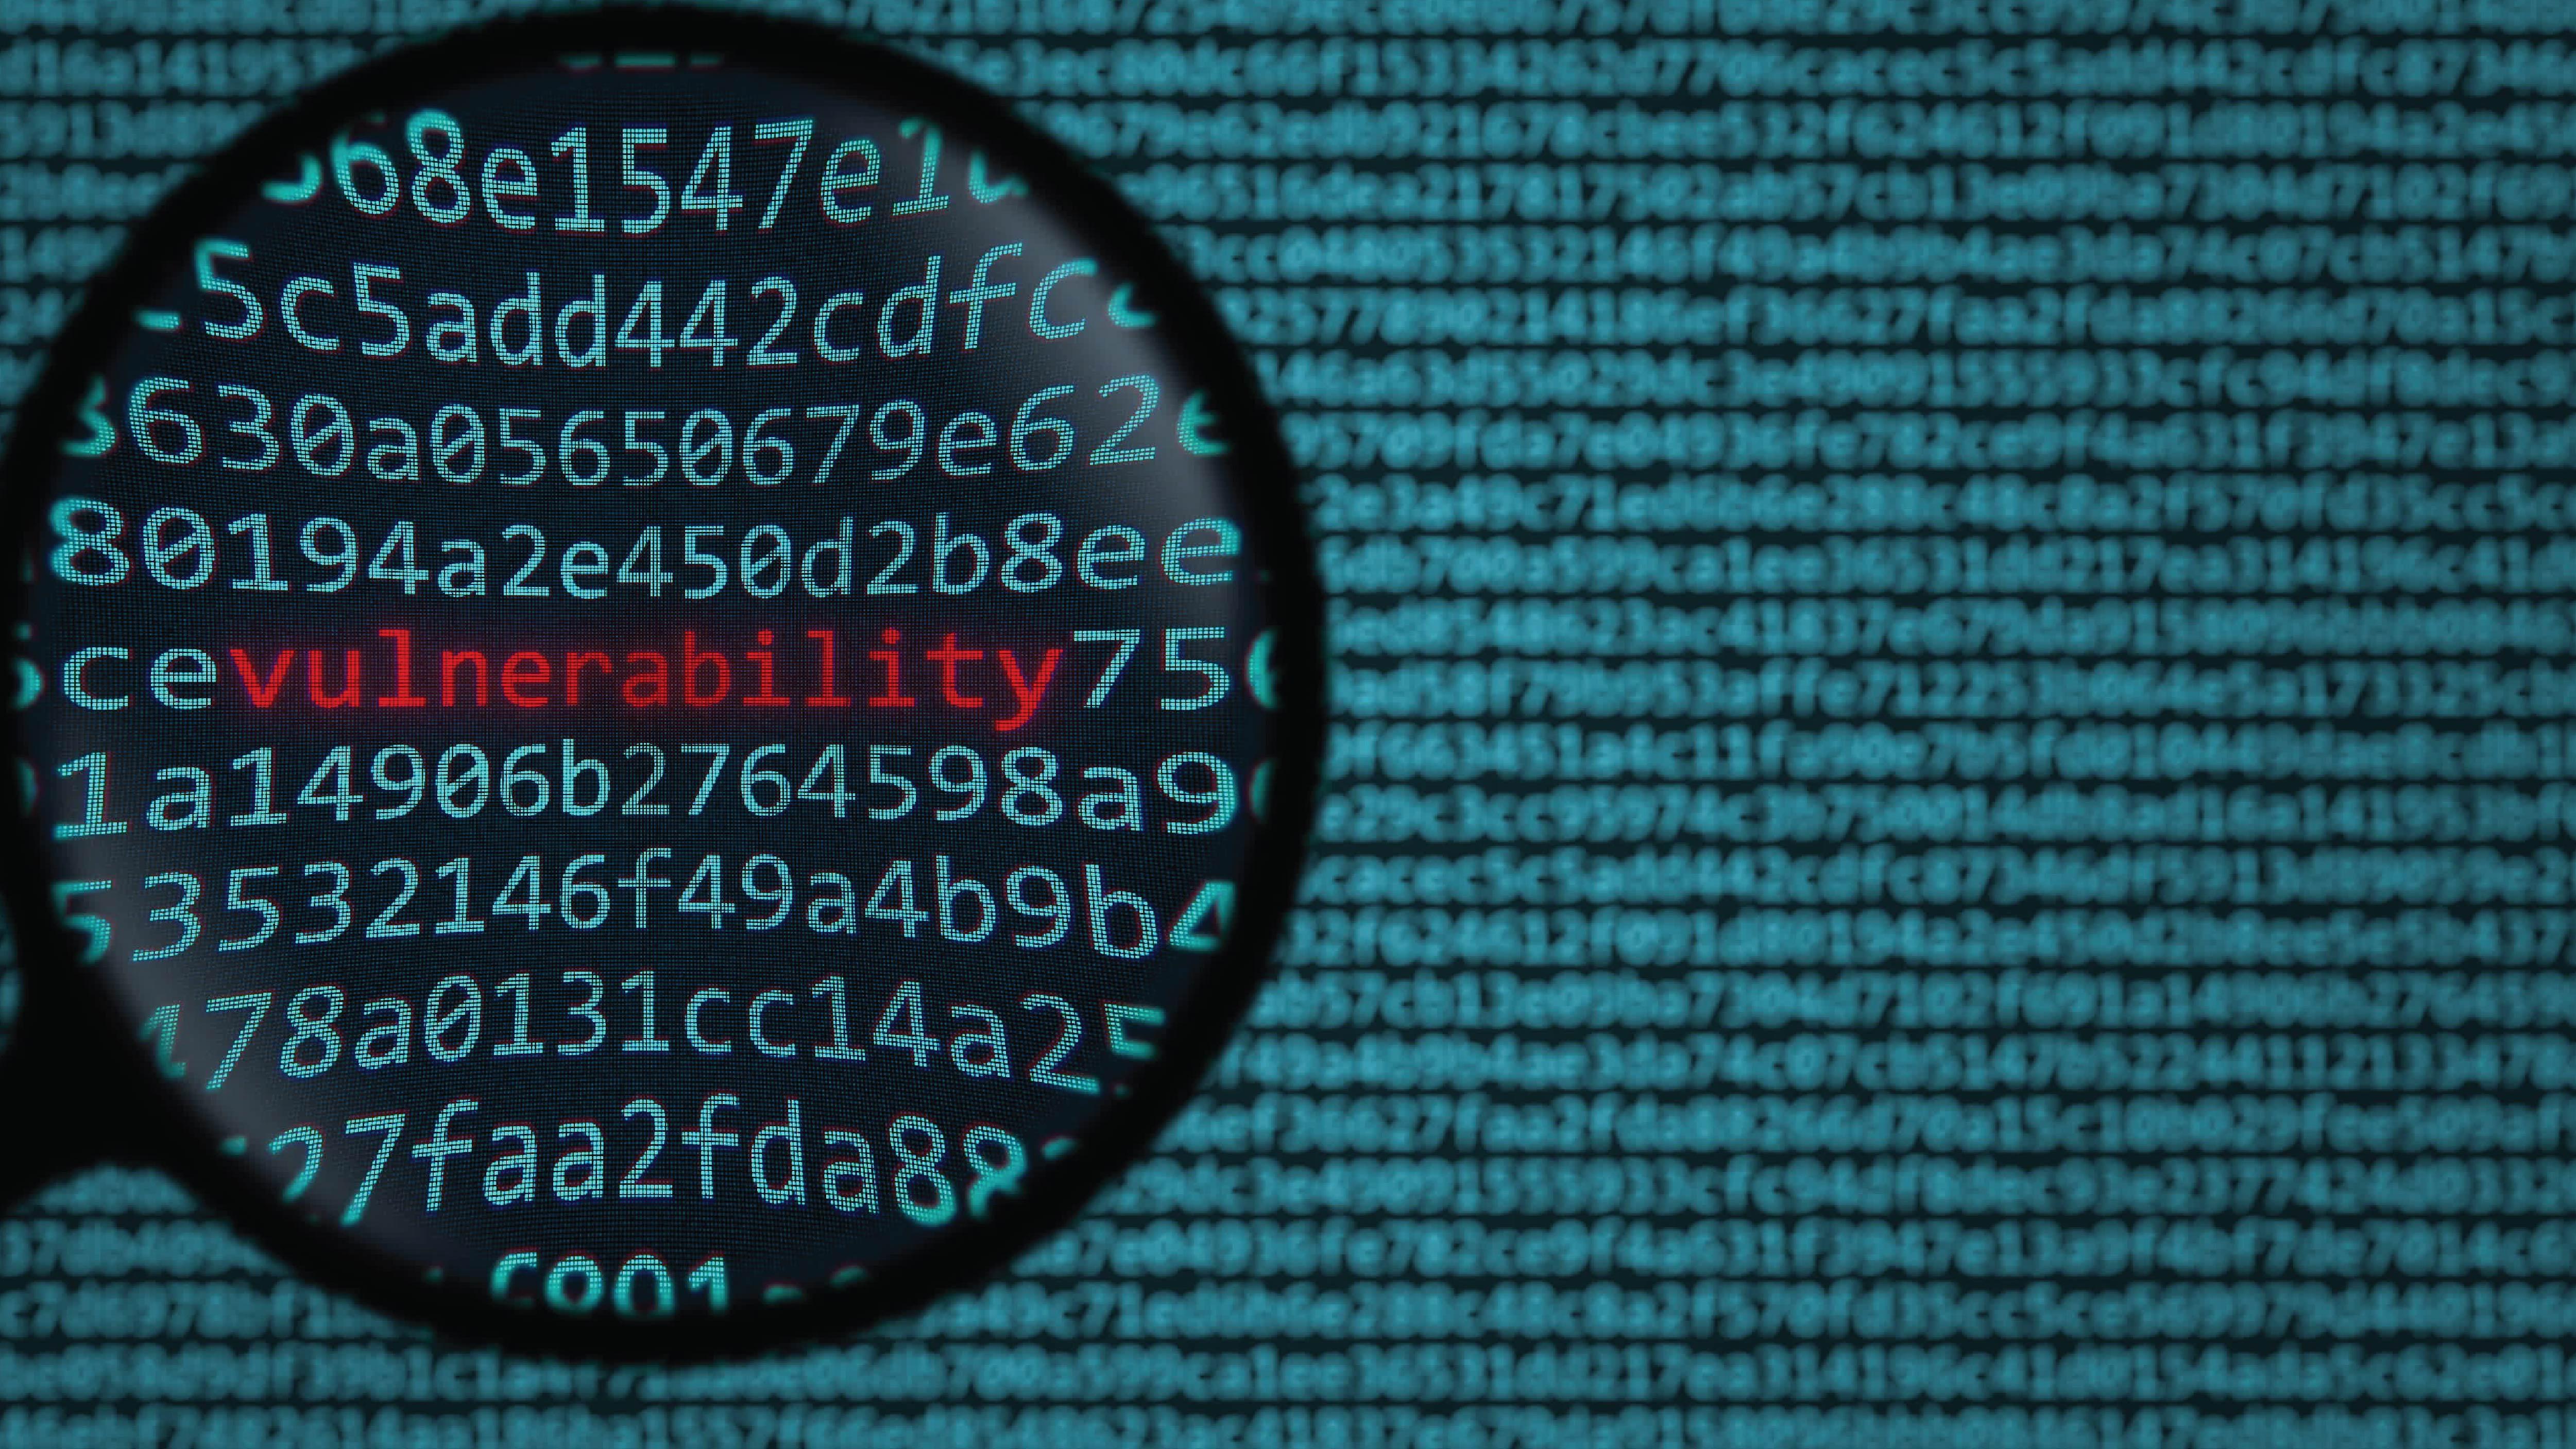 Exploit Prevention Techniques Can End Zero-day Vulnerabilities